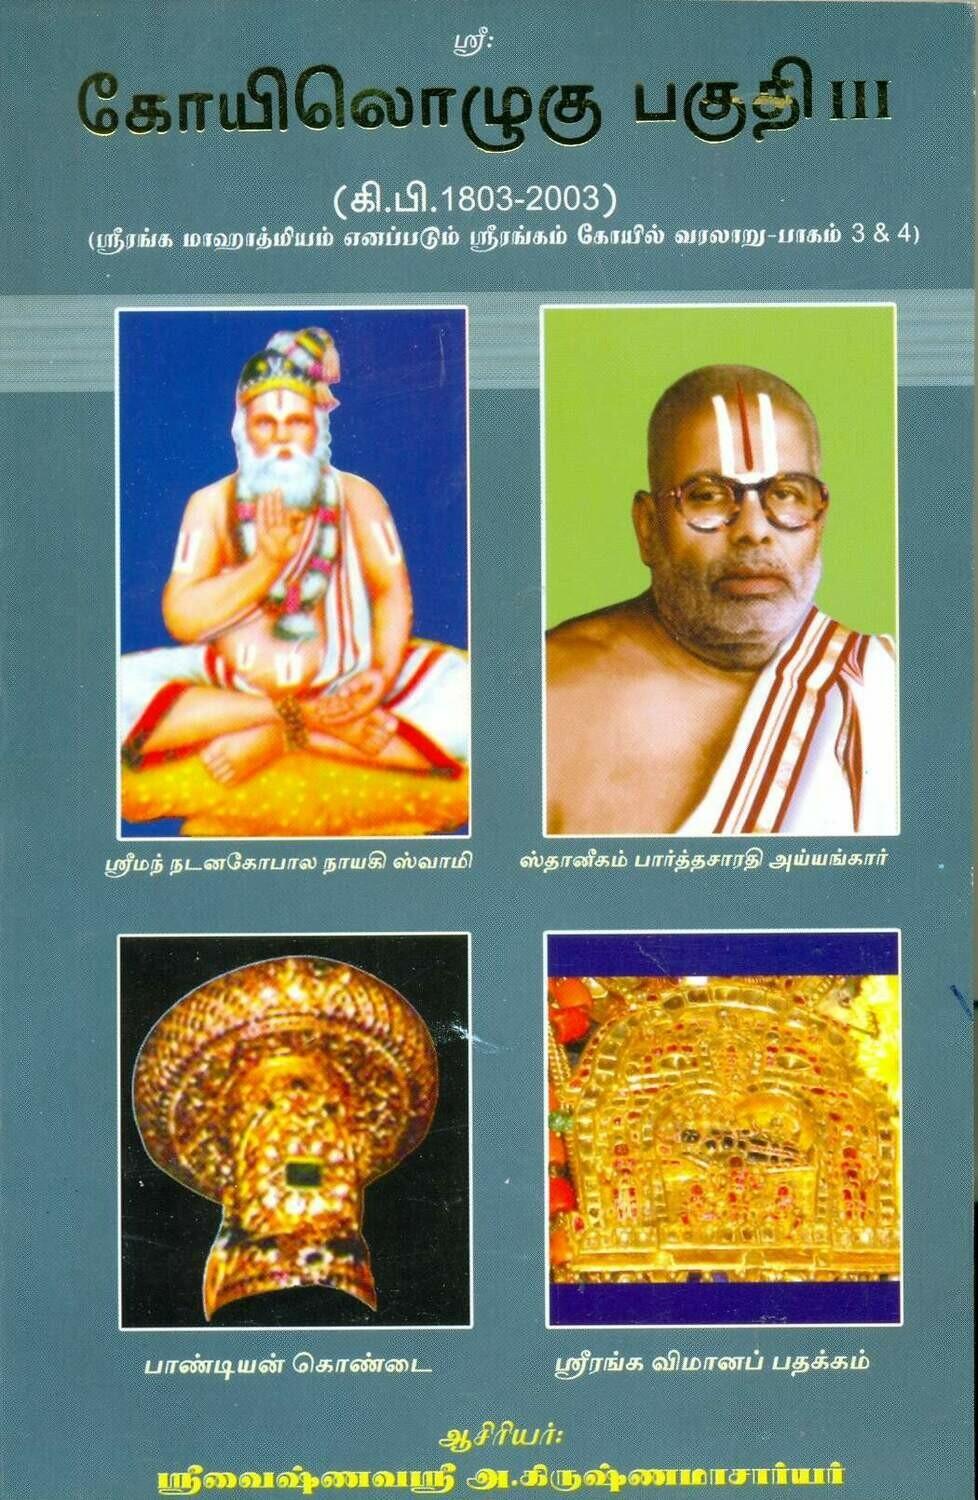 KO III Sri Vaishnava Saandror charithram  ஸ்ரீரங்கத்து ஸ்ரீவைஷ்ணவ சான்றோர் சரித்ரம்